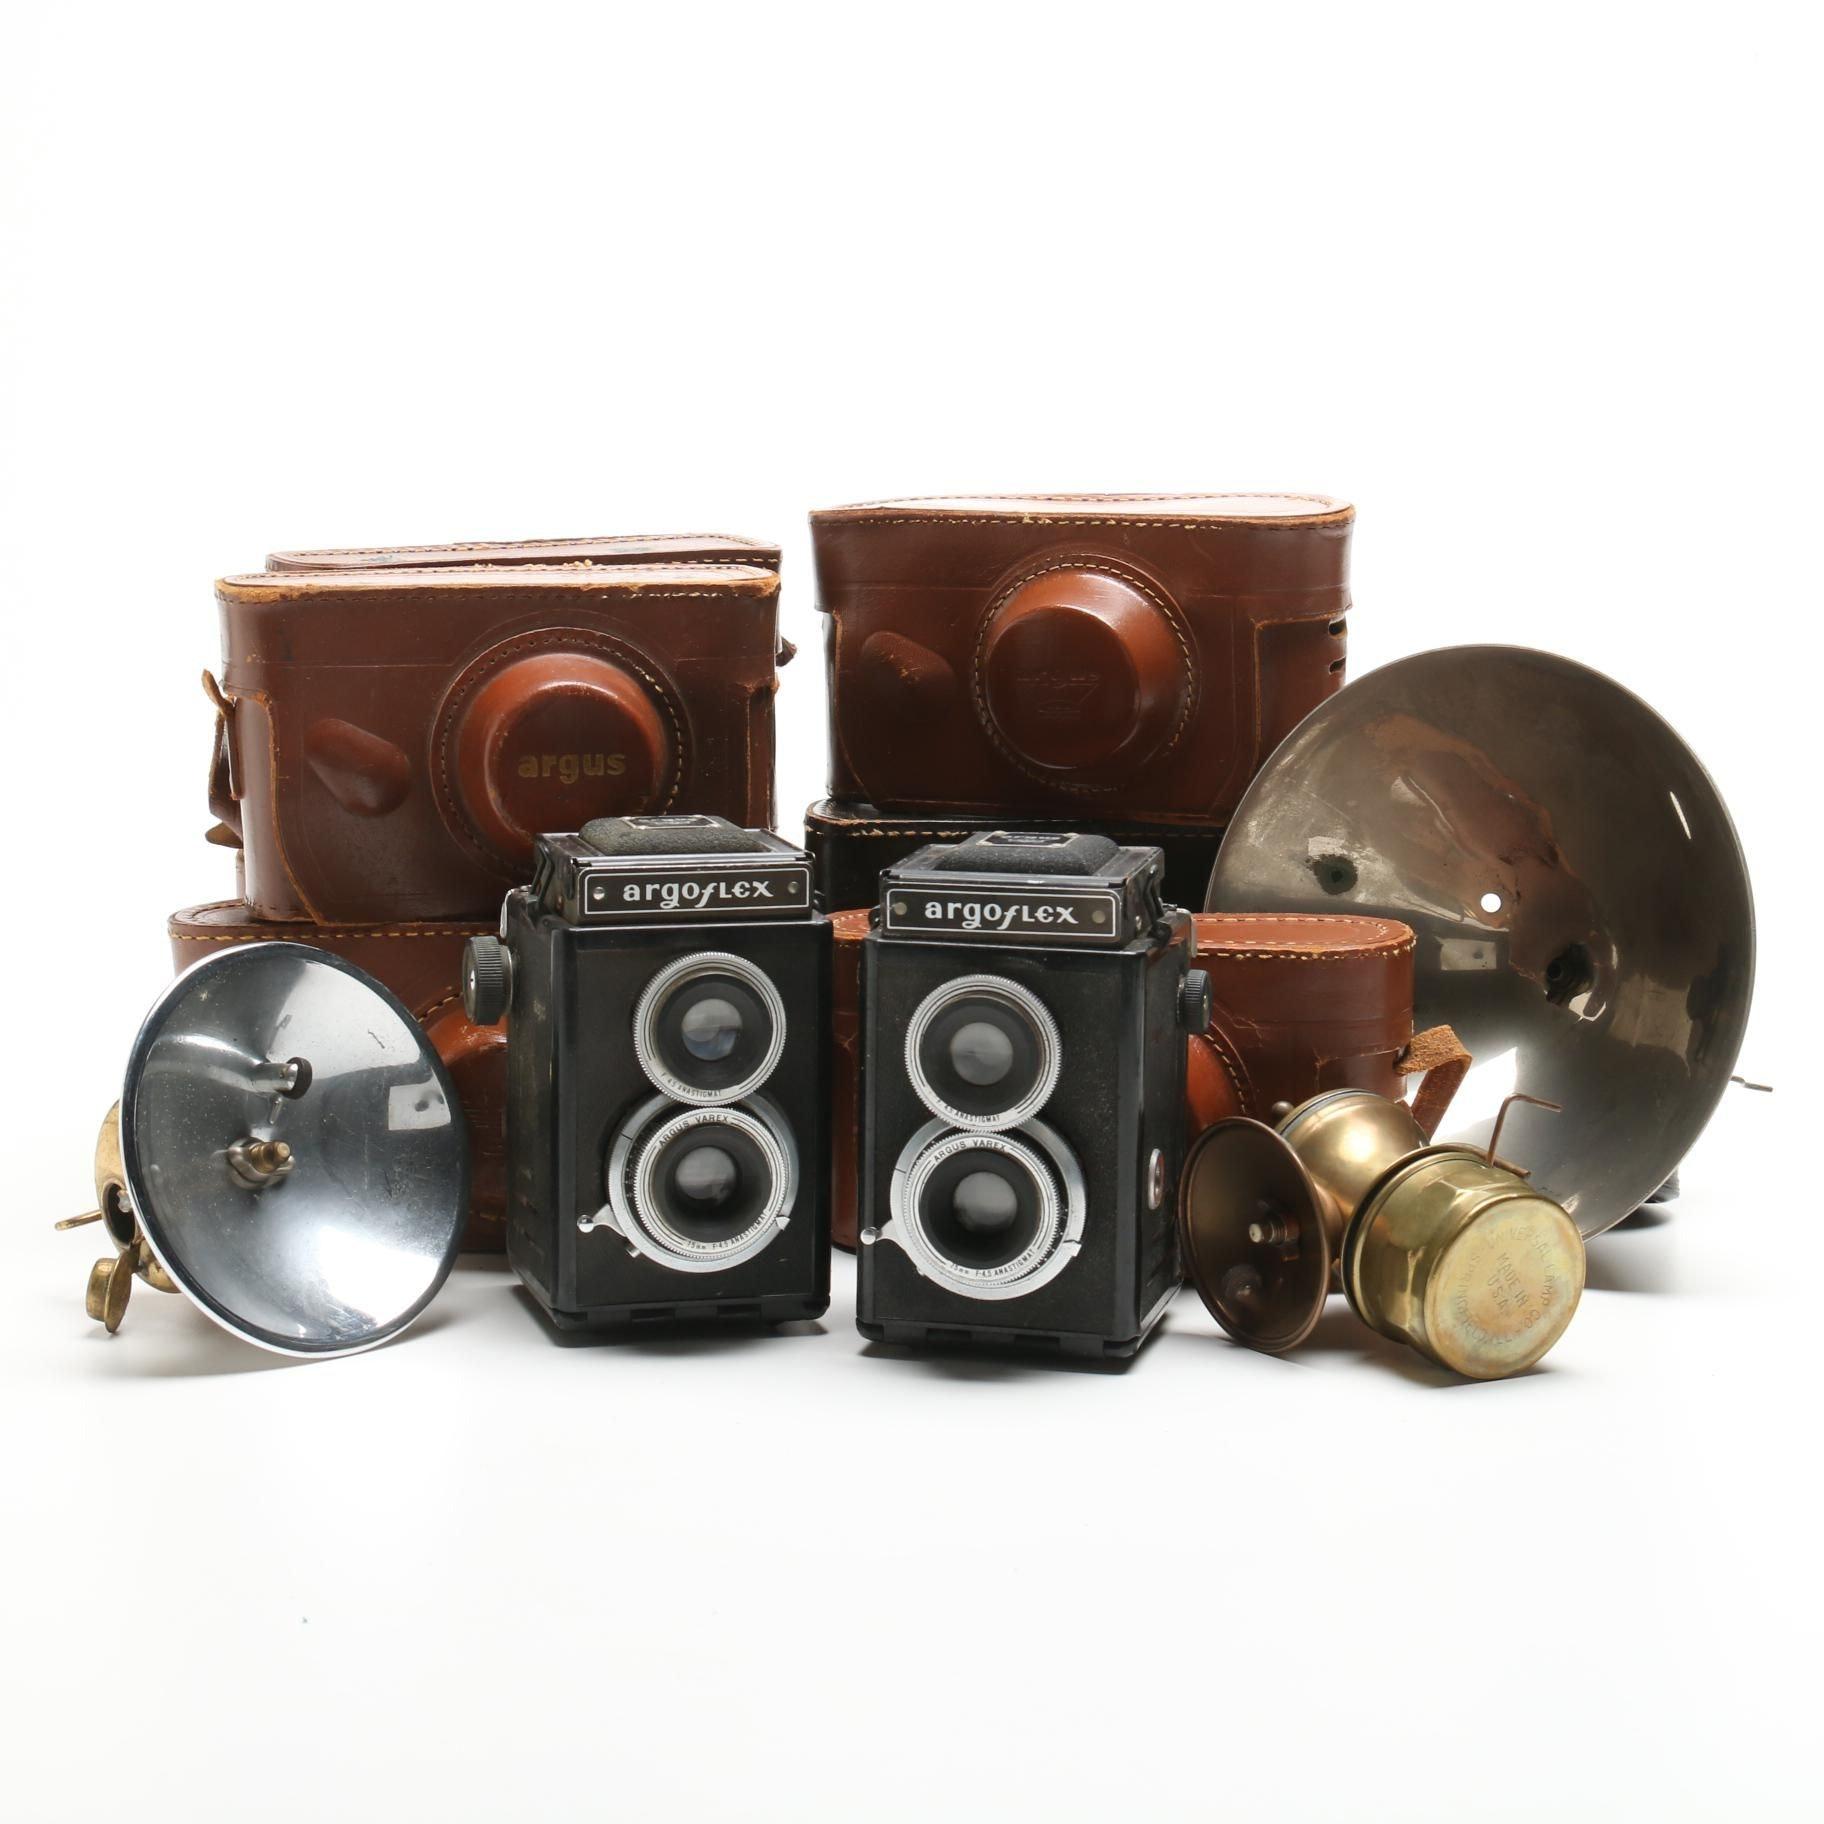 Collection of Vintage Argus C3 and Argoflex Cameras